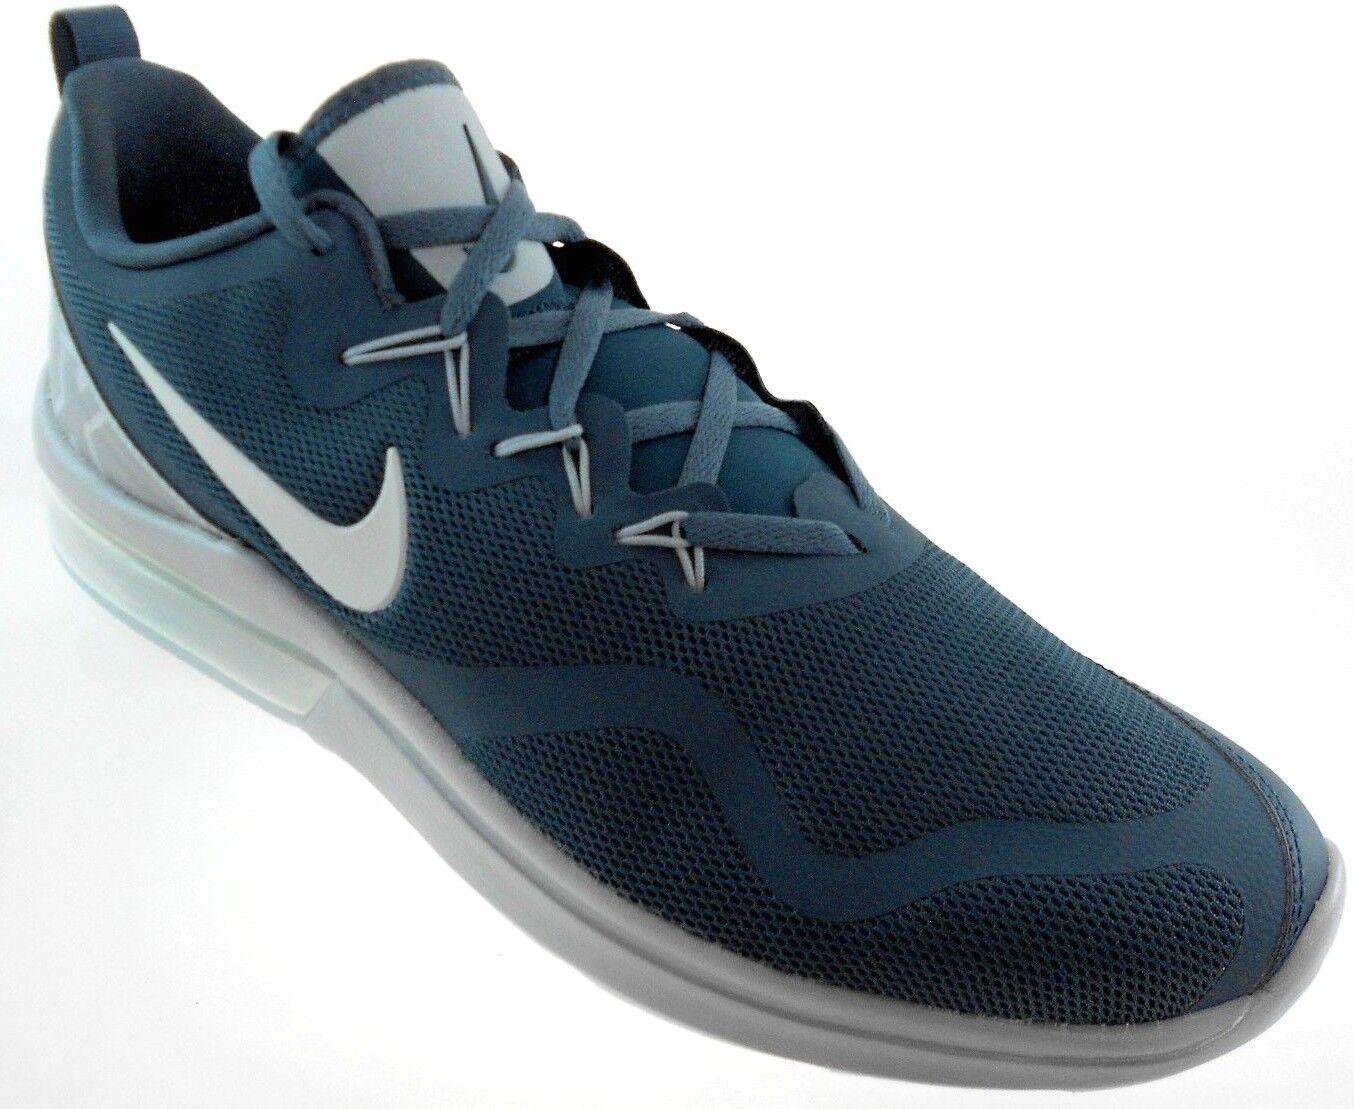 Nike air max fury scarpe uomini blue fox di scarpe fury da corsa # aa5739-403. 03d5cb